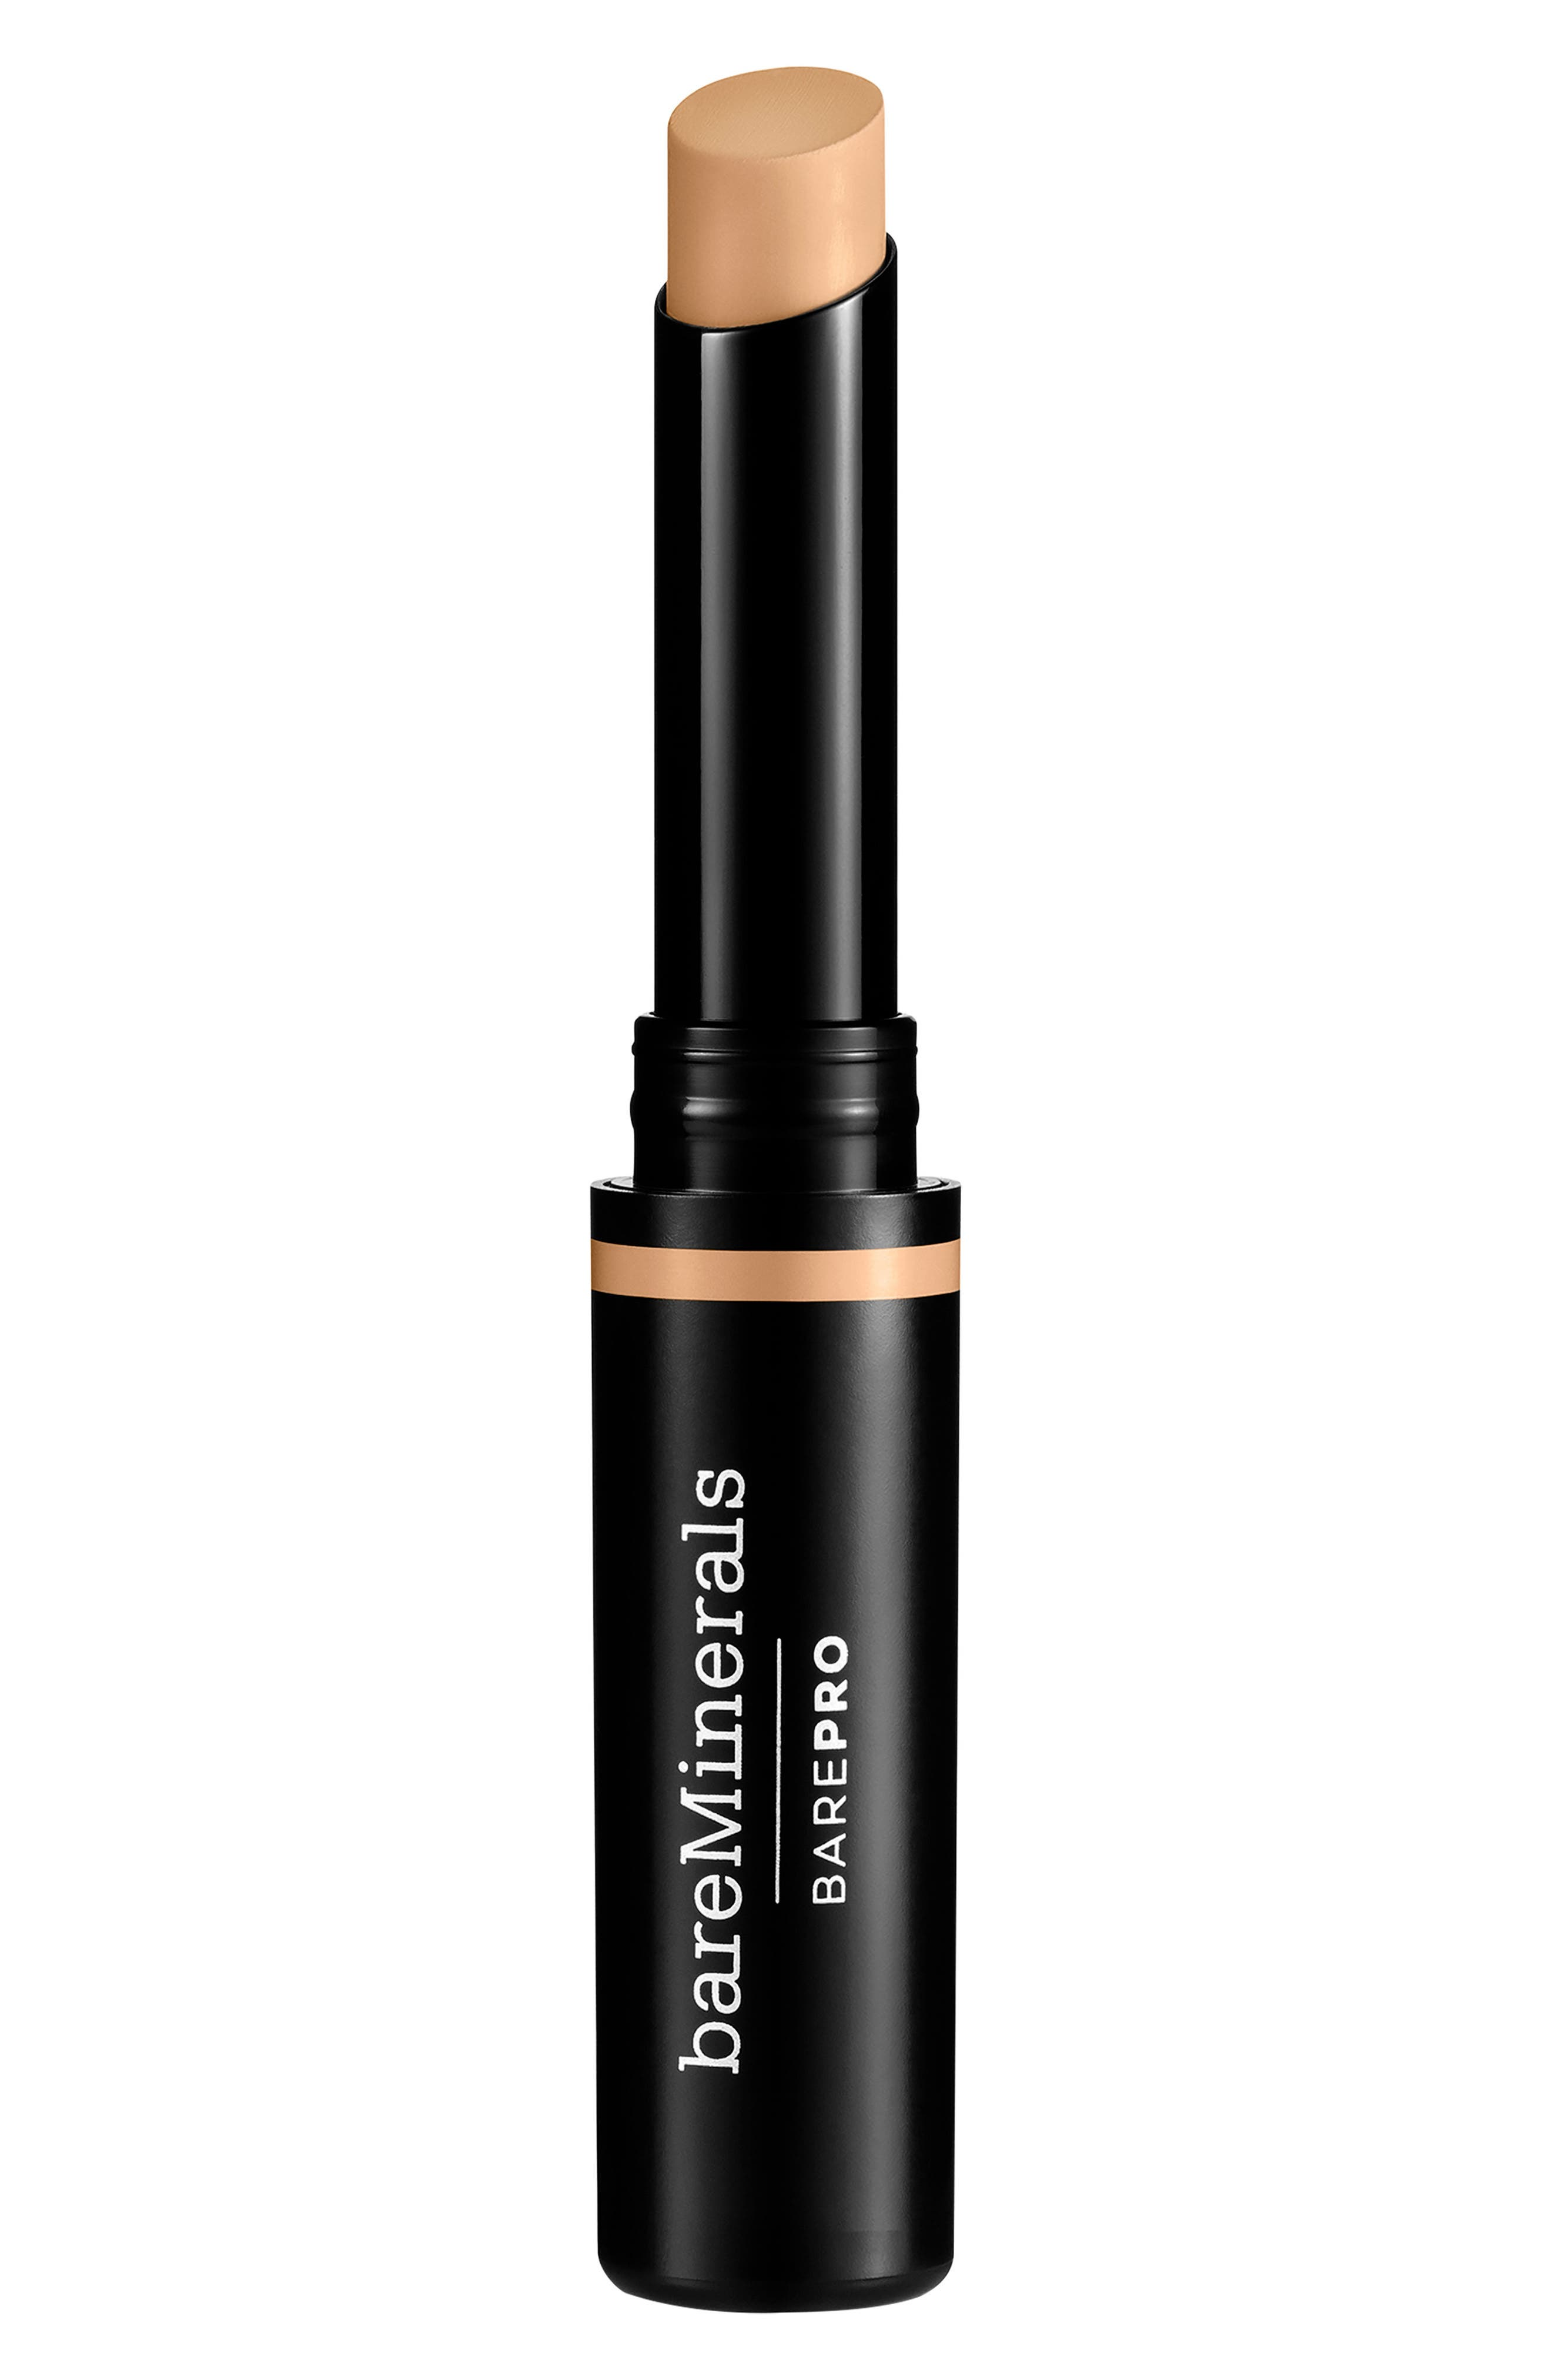 BarePro<sup>®</sup> Stick Concealer,                         Main,                         color, 09 Tan-Warm